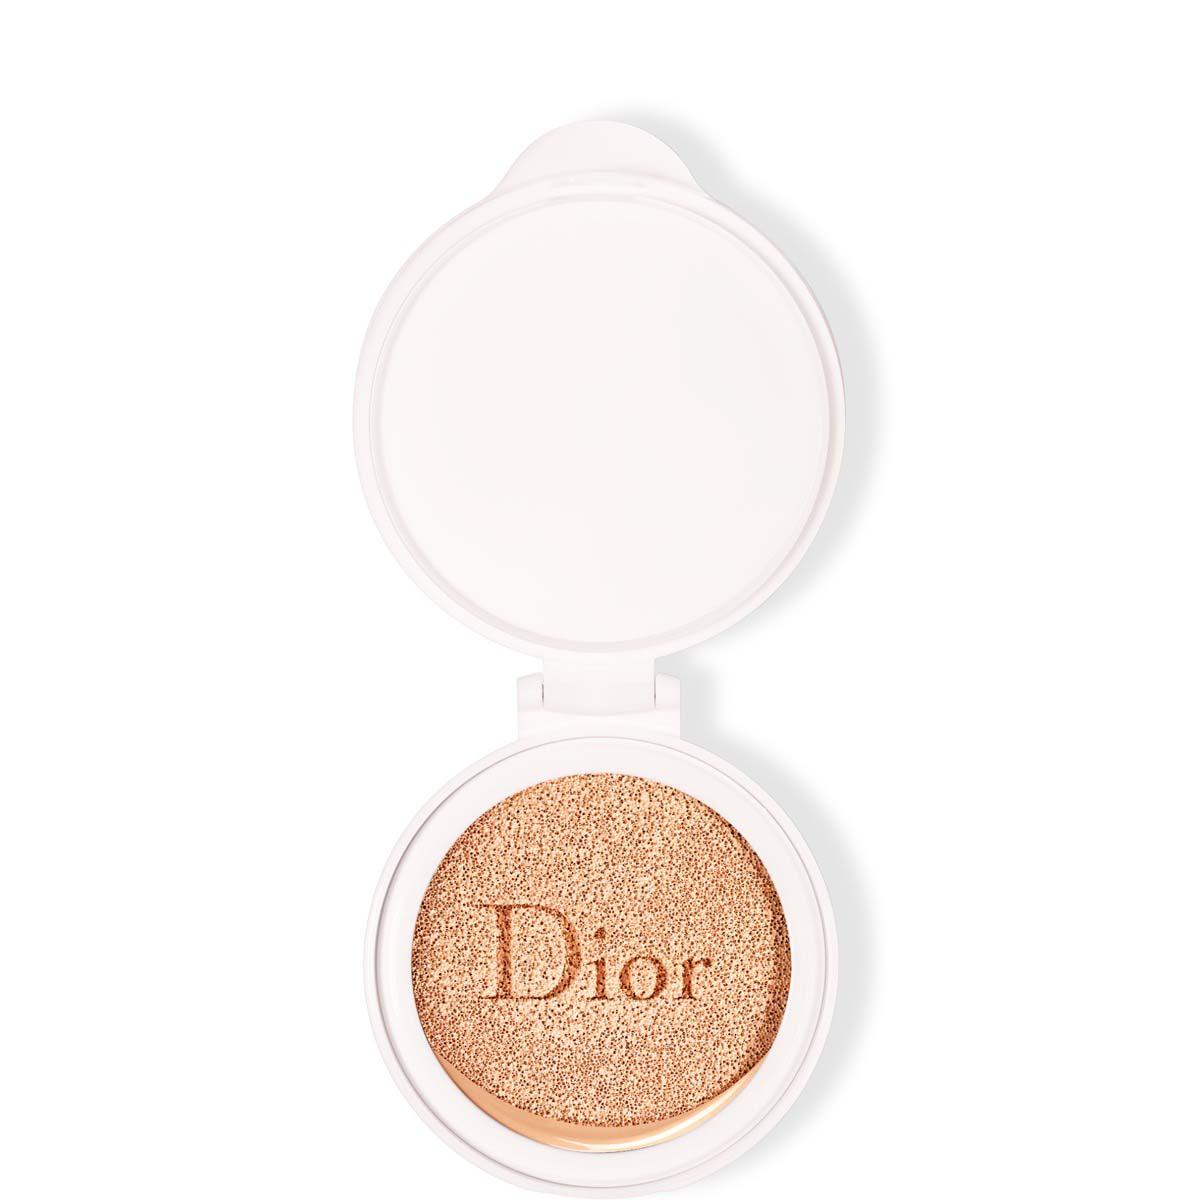 Dior - Capture Dreamskin Moist & Perfect Cushion SPF 50 PA+++ - La Recharge